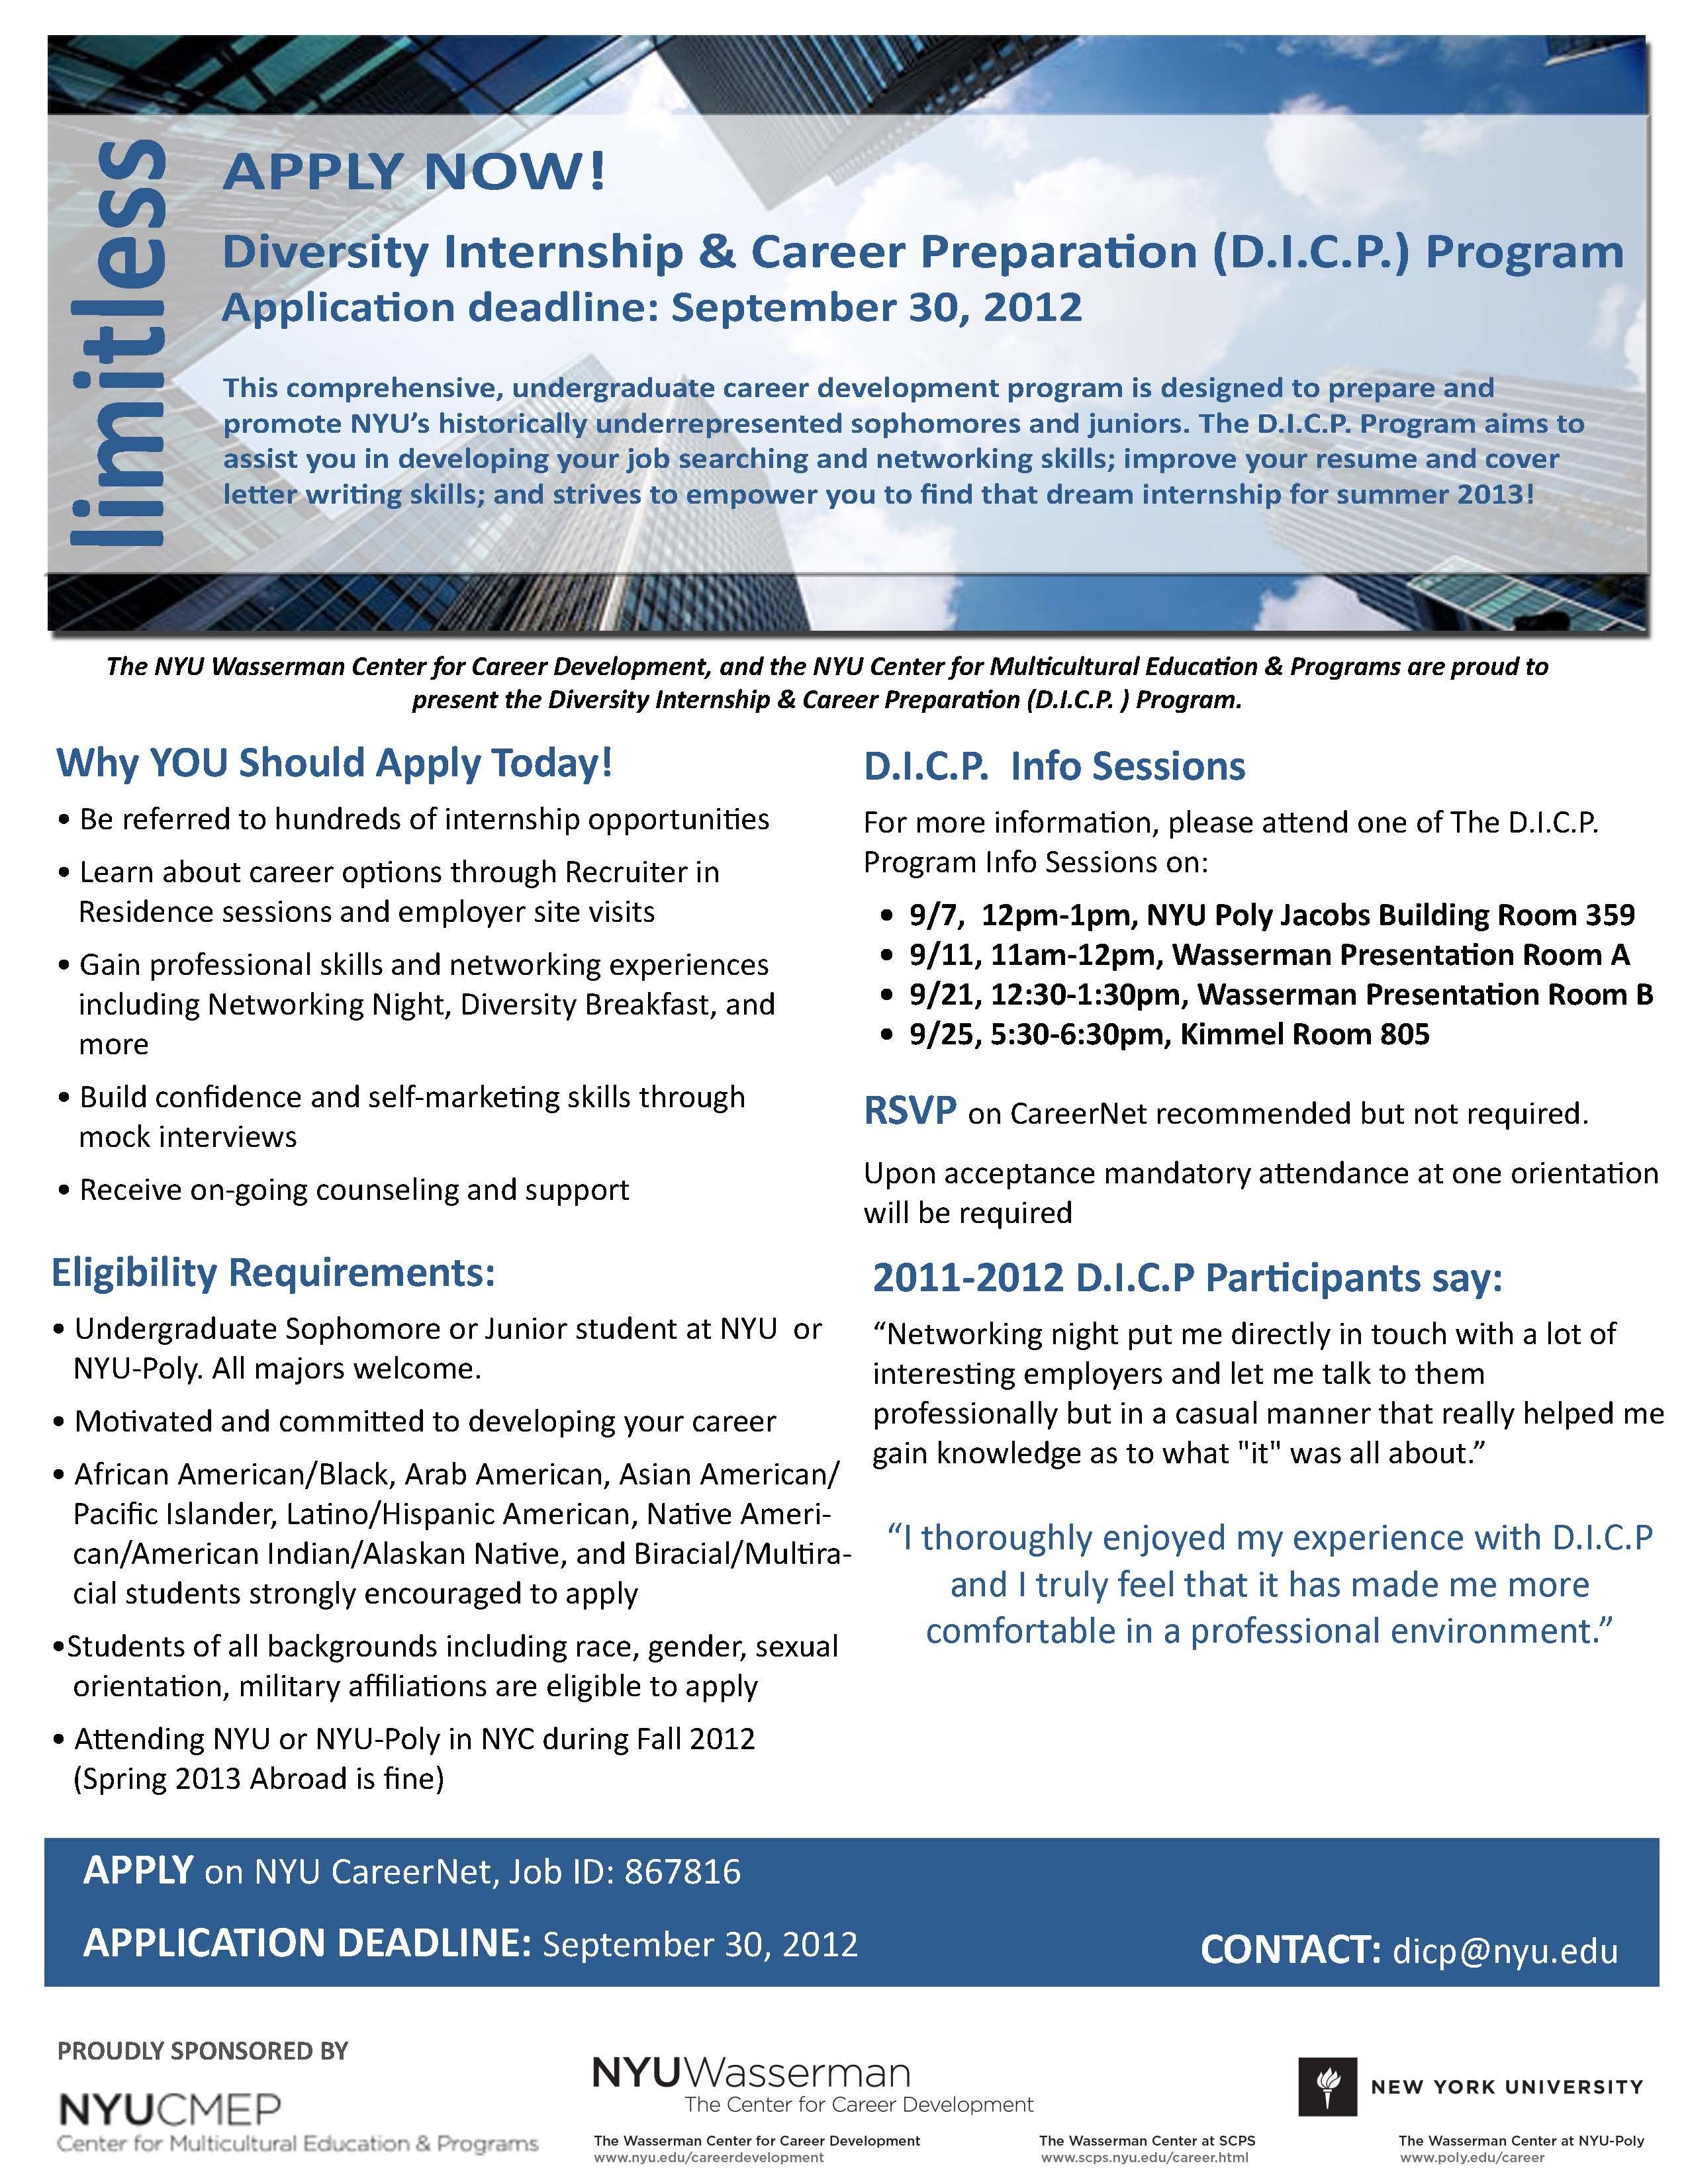 Apply for the Diversity Internship & Career Preparation Program